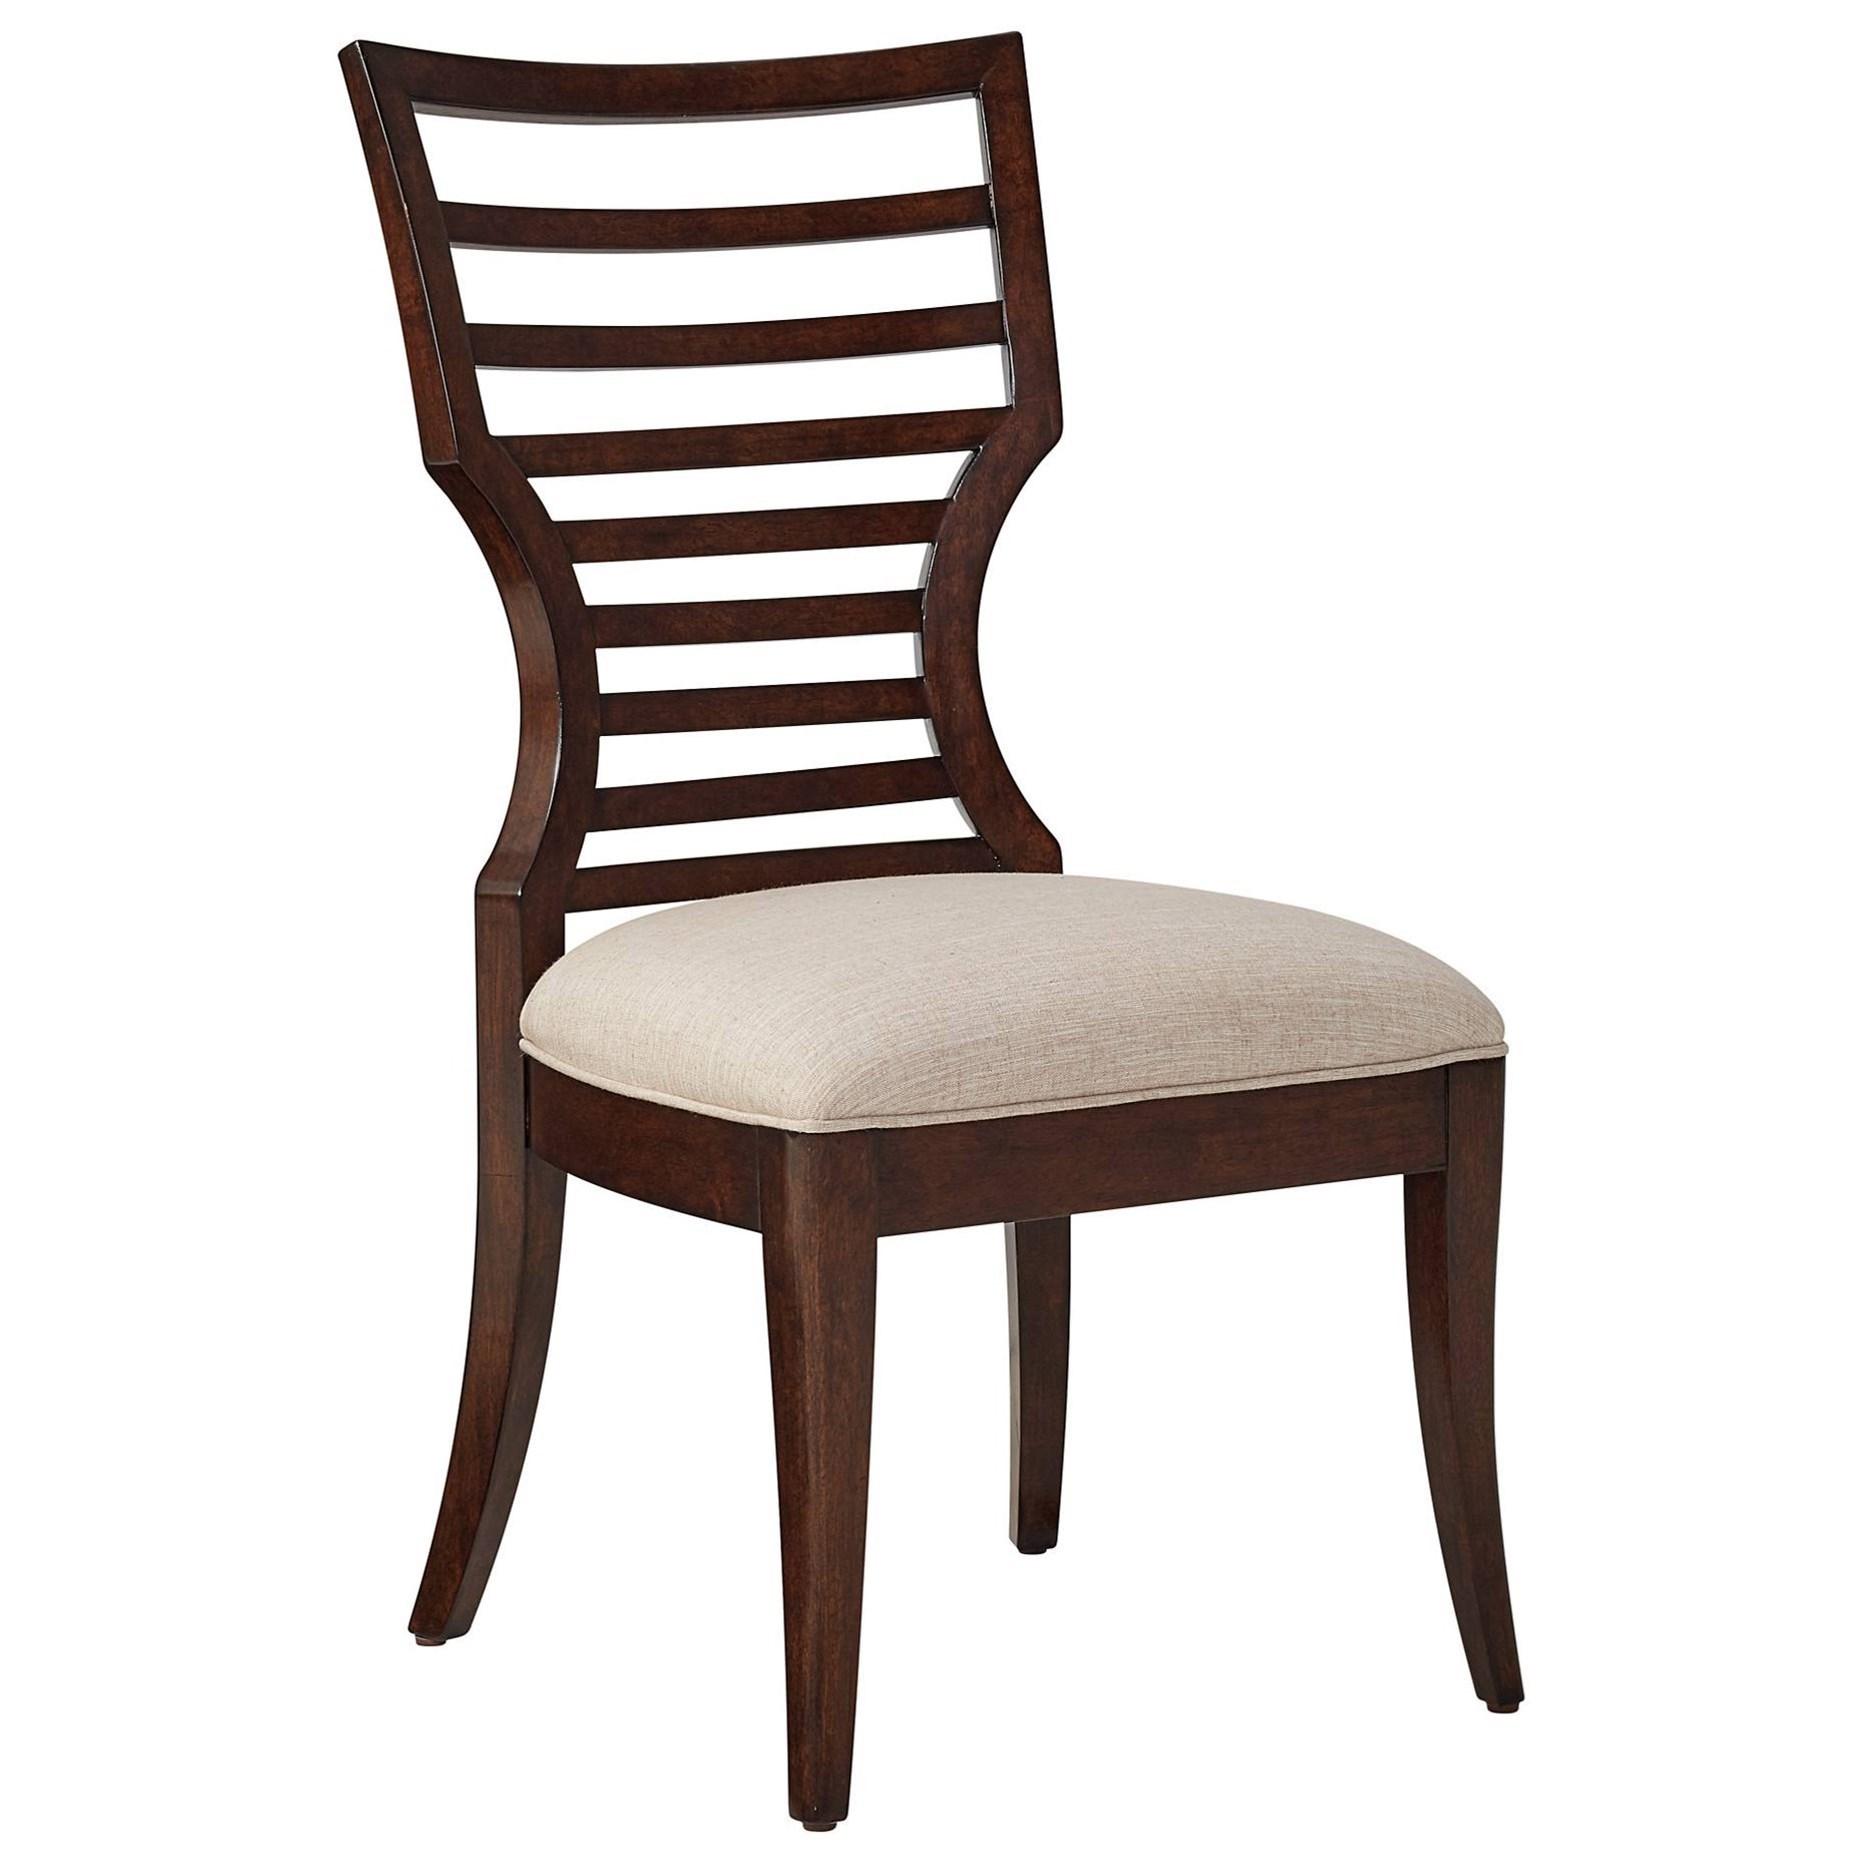 Becker Furniture Burnsville By Stanley Furniture Virage Wood Side Chair  With Modern ...